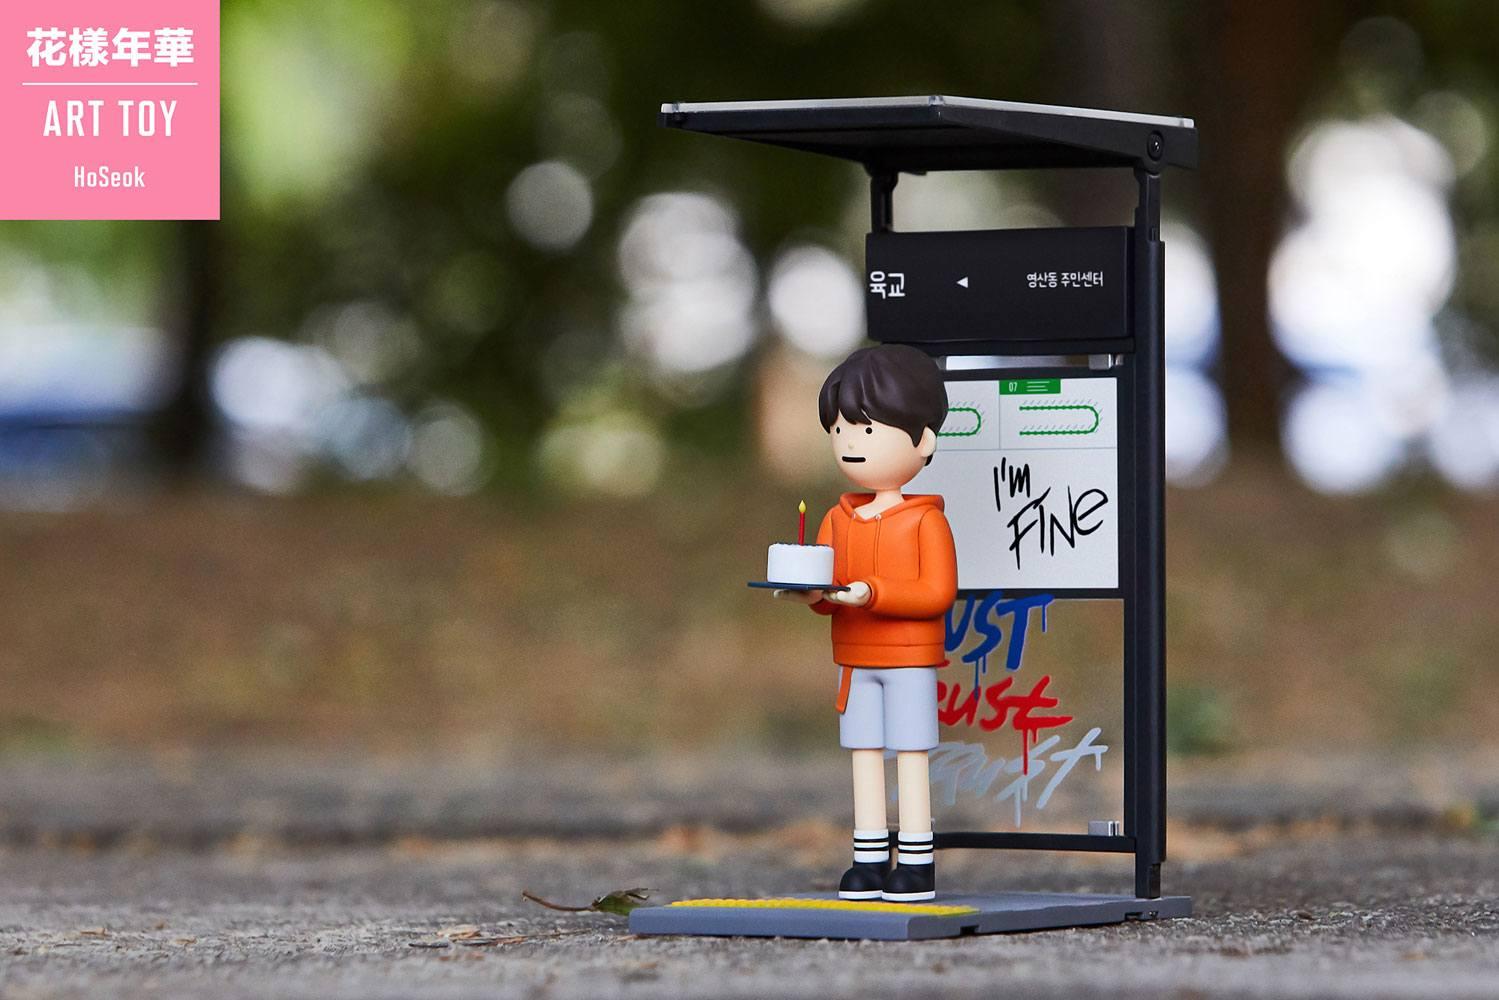 BTS Art Toy PVC Statue J-Hope (Jung Hoseok) 15 cm